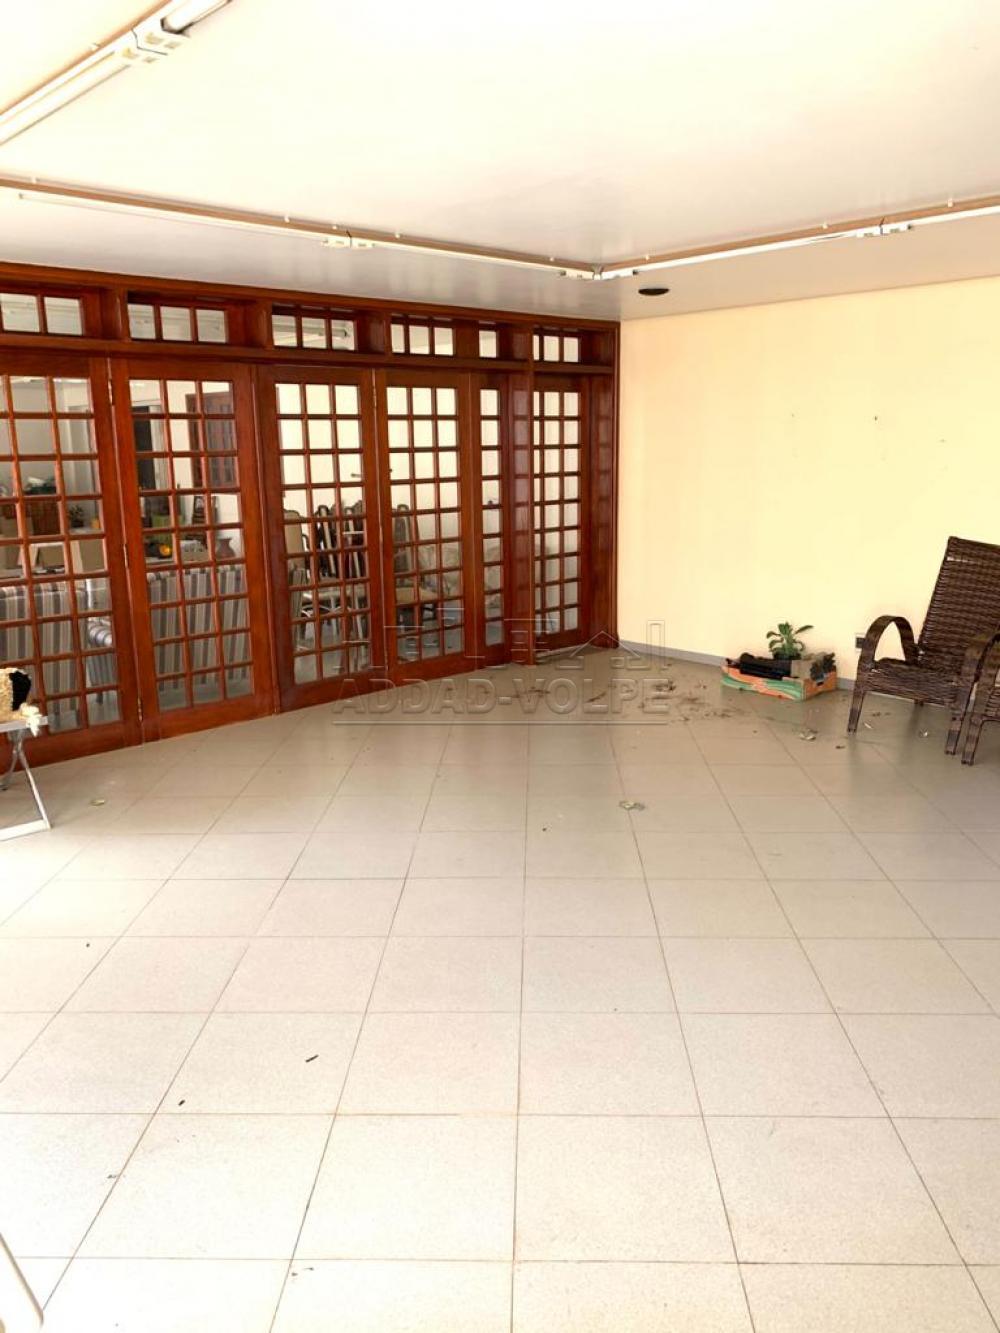 Alugar Casa / Sobrado em Bauru R$ 15.000,00 - Foto 20